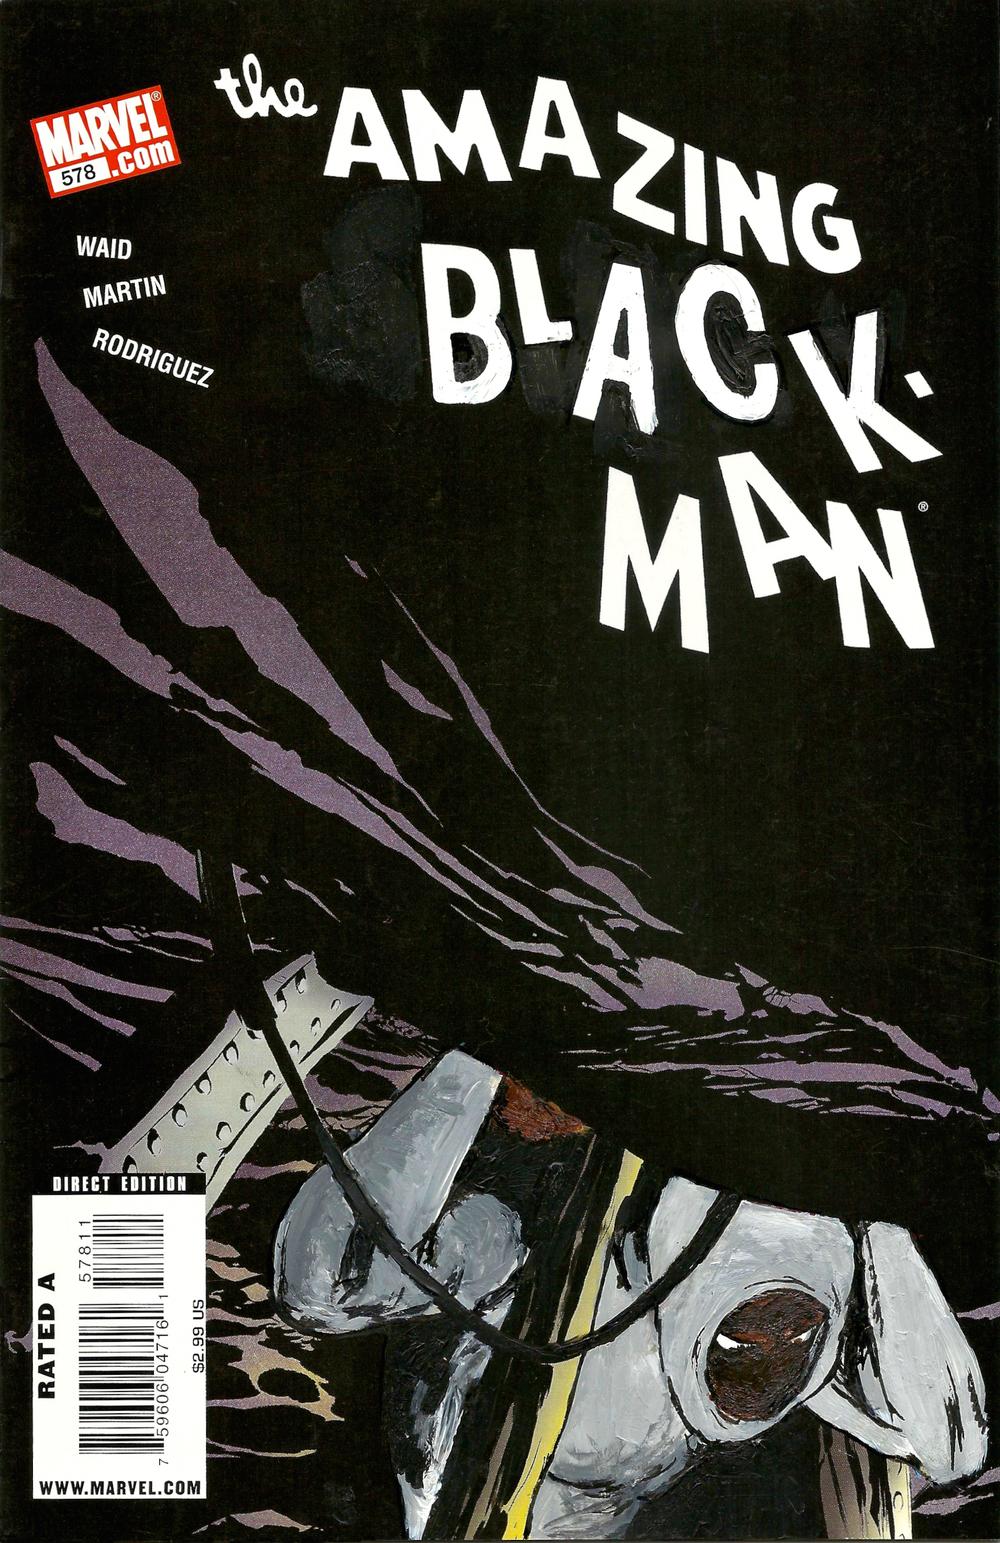 The Amazing Black-Man #578